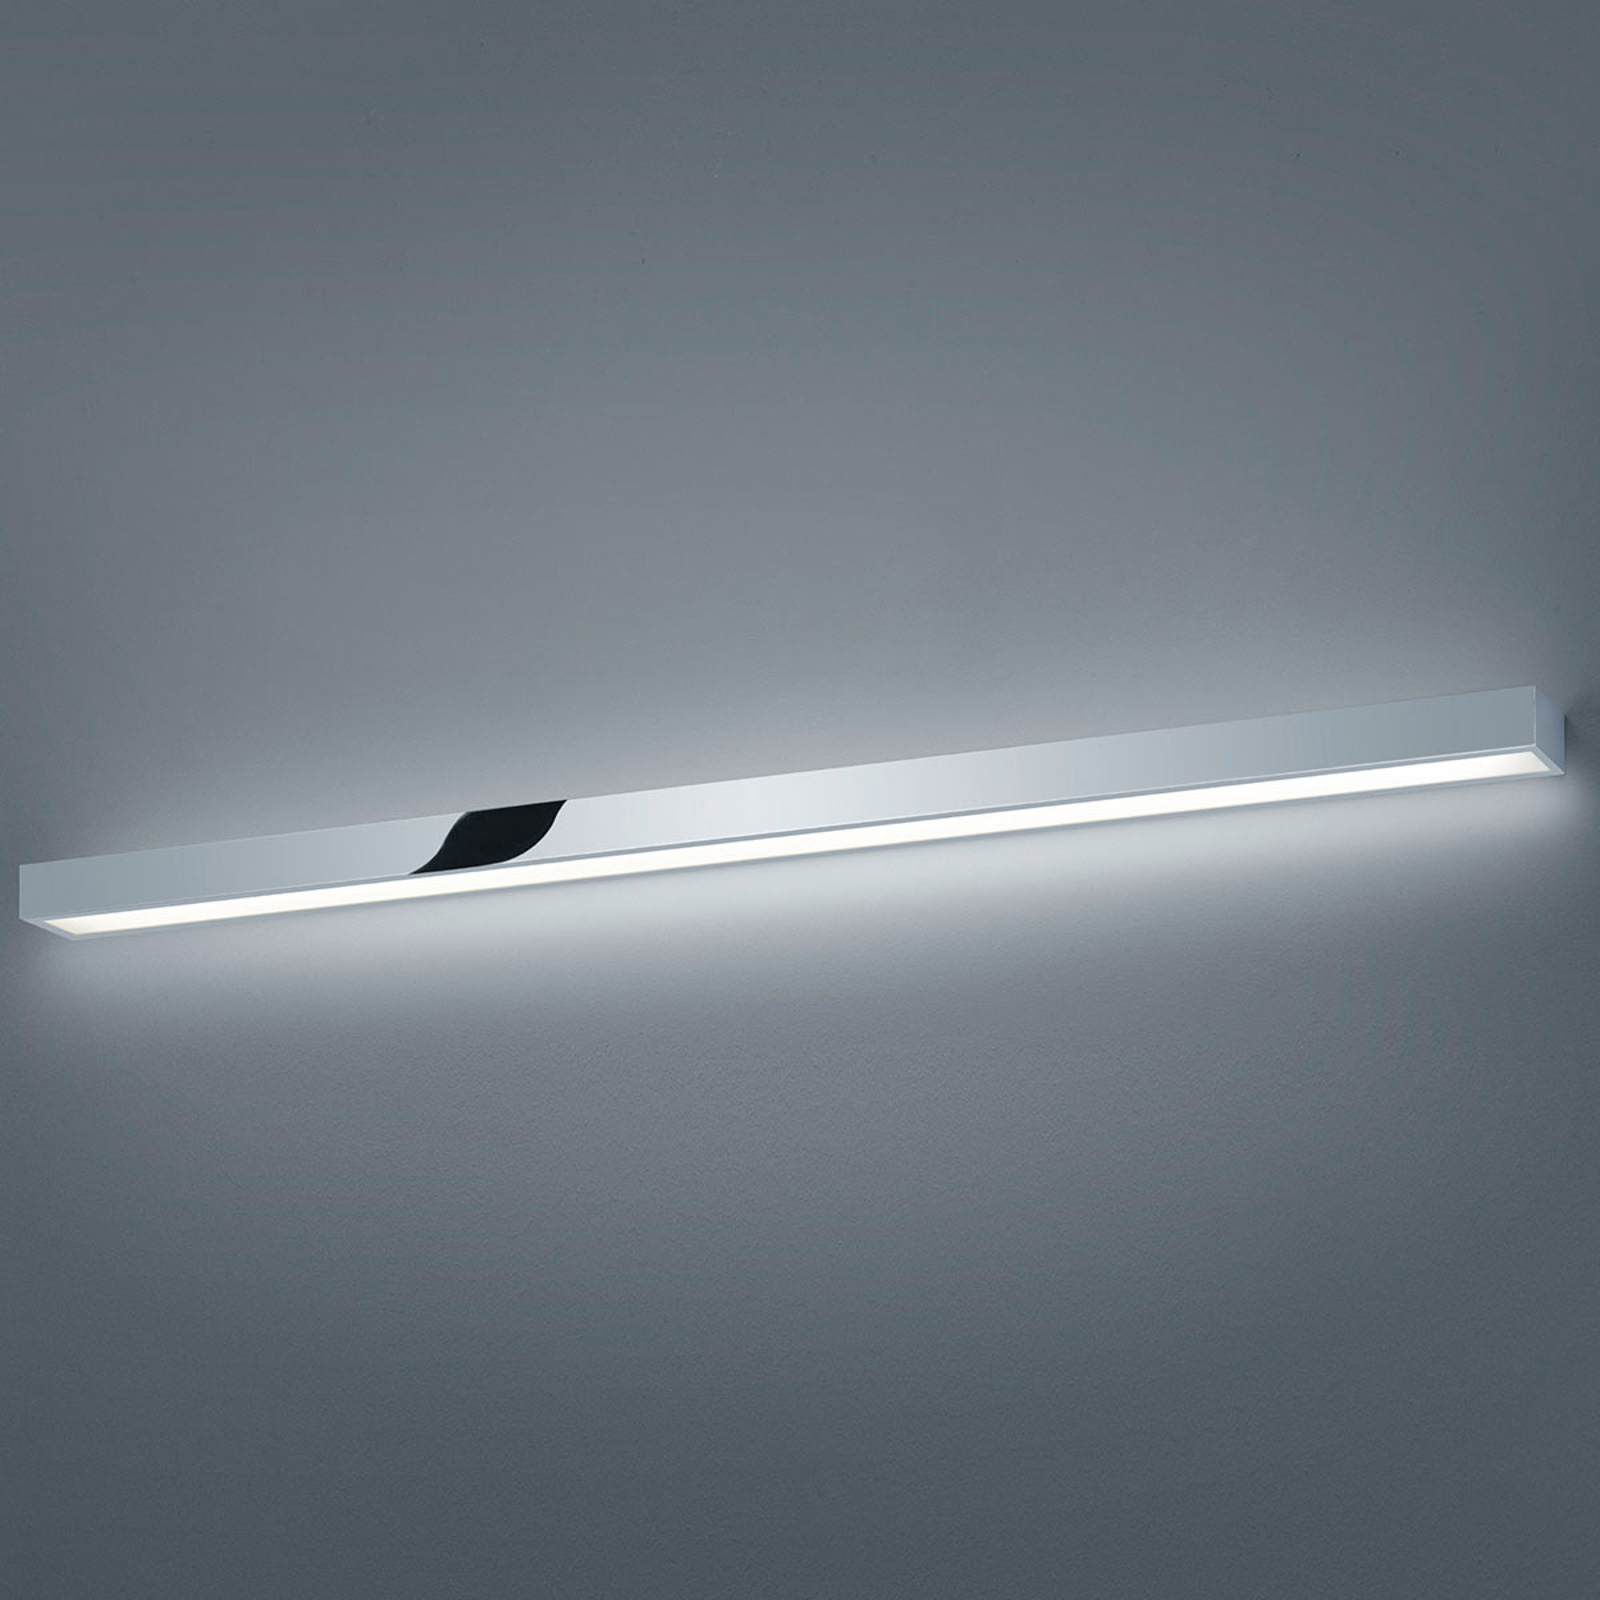 LED spiegellamp Helestra Theia, verchroomd 120cm